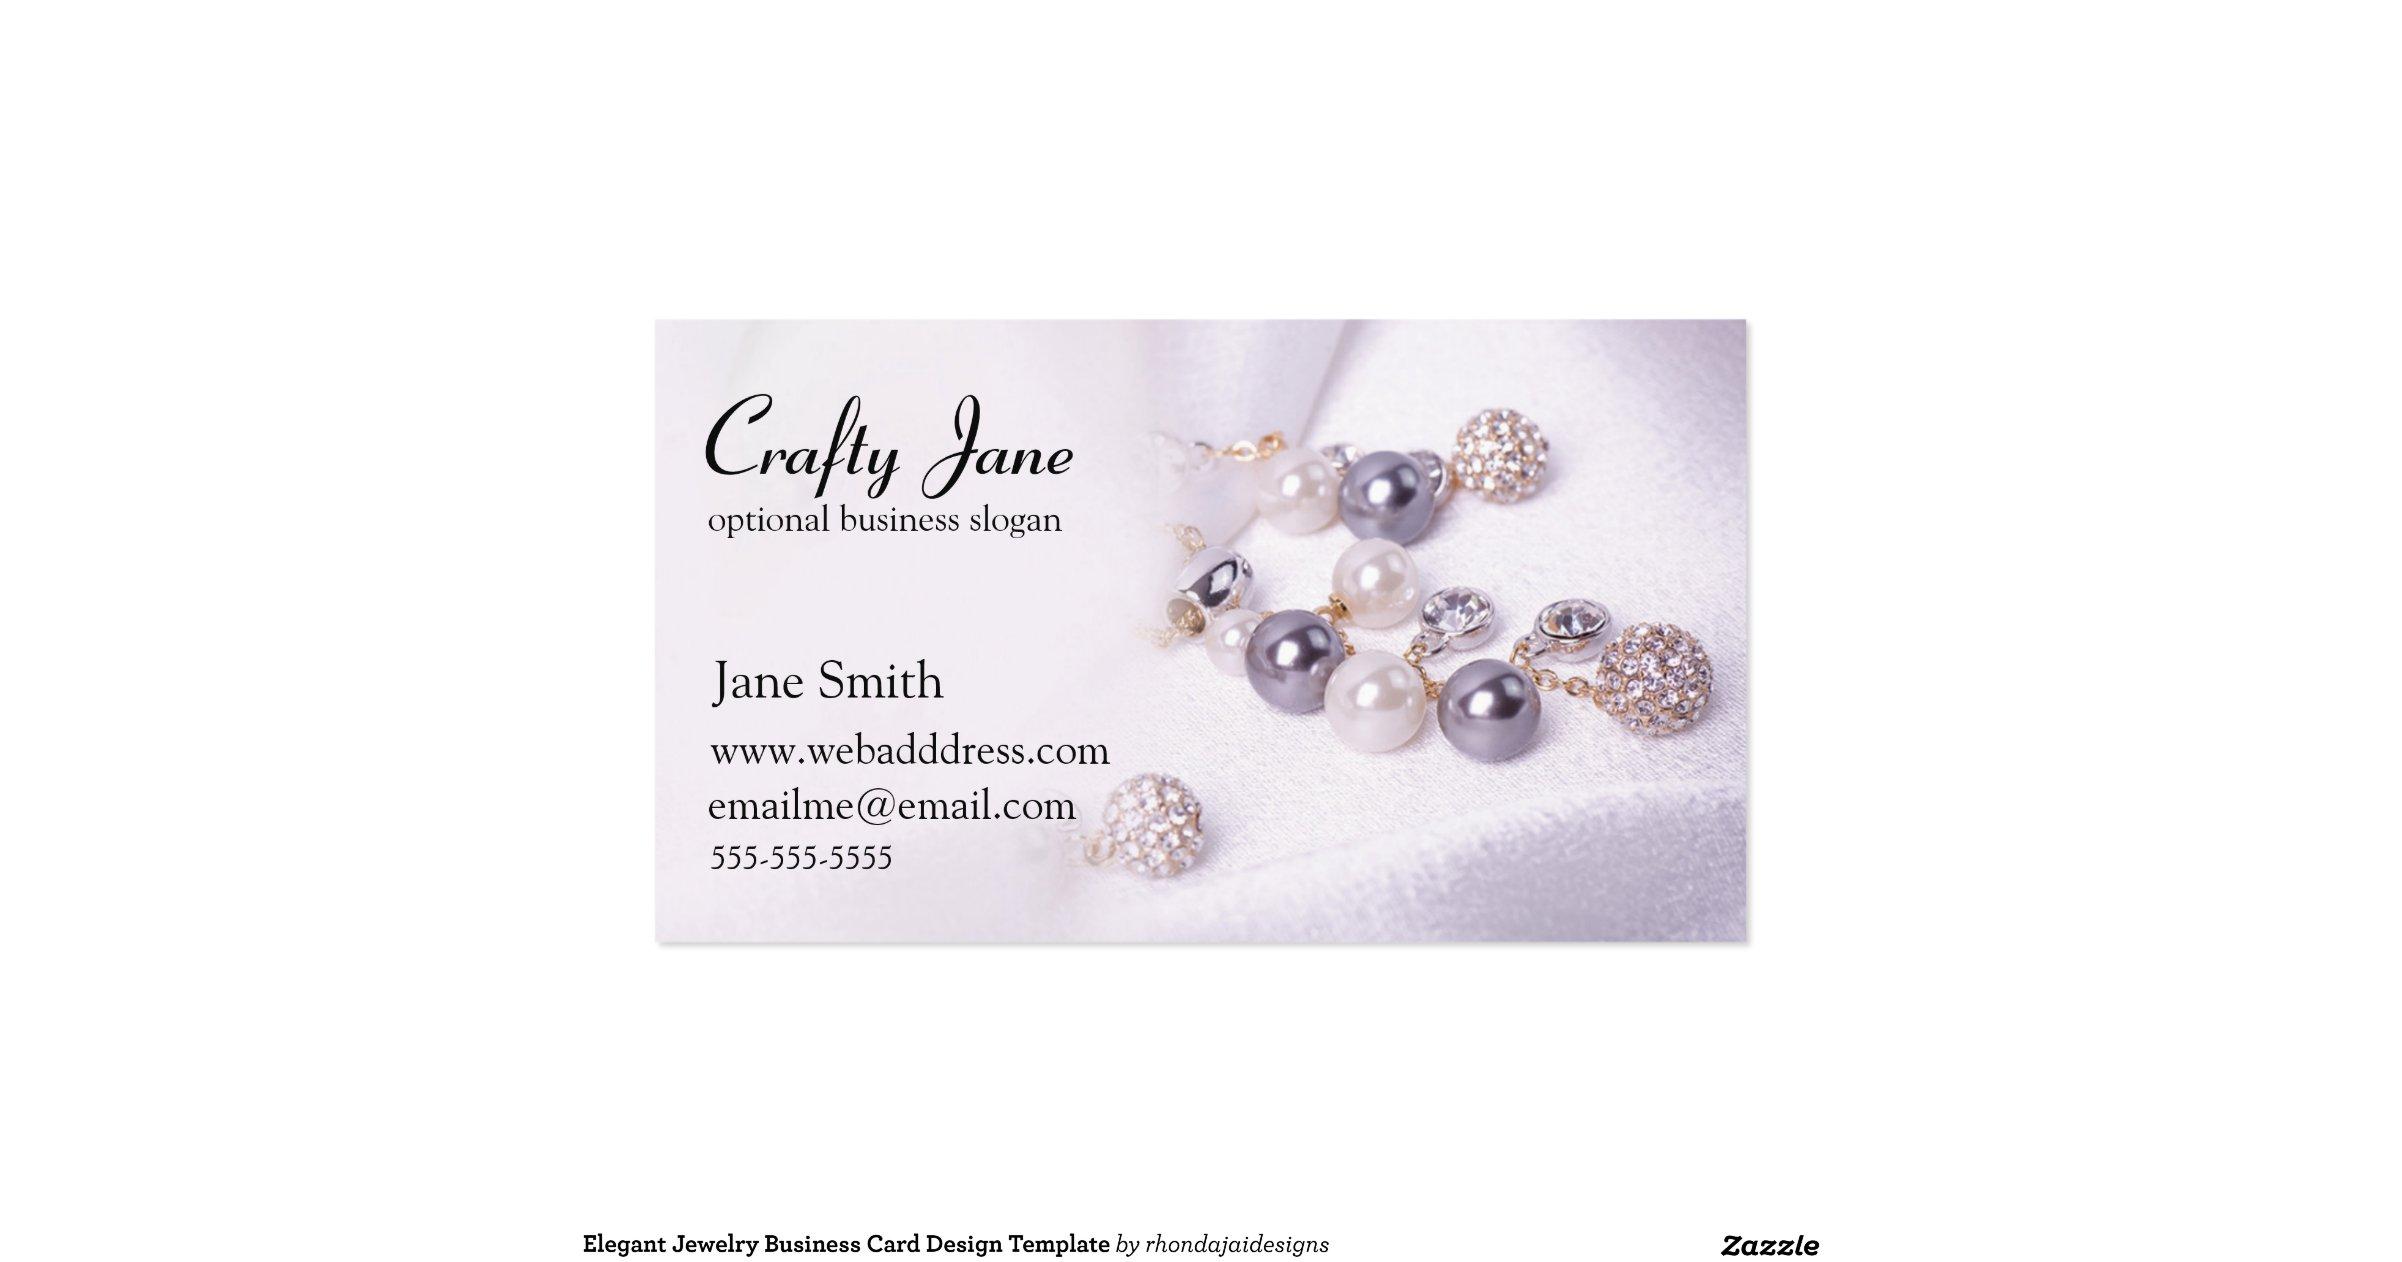 elegantjewelrybusinesscarddesigntemplate